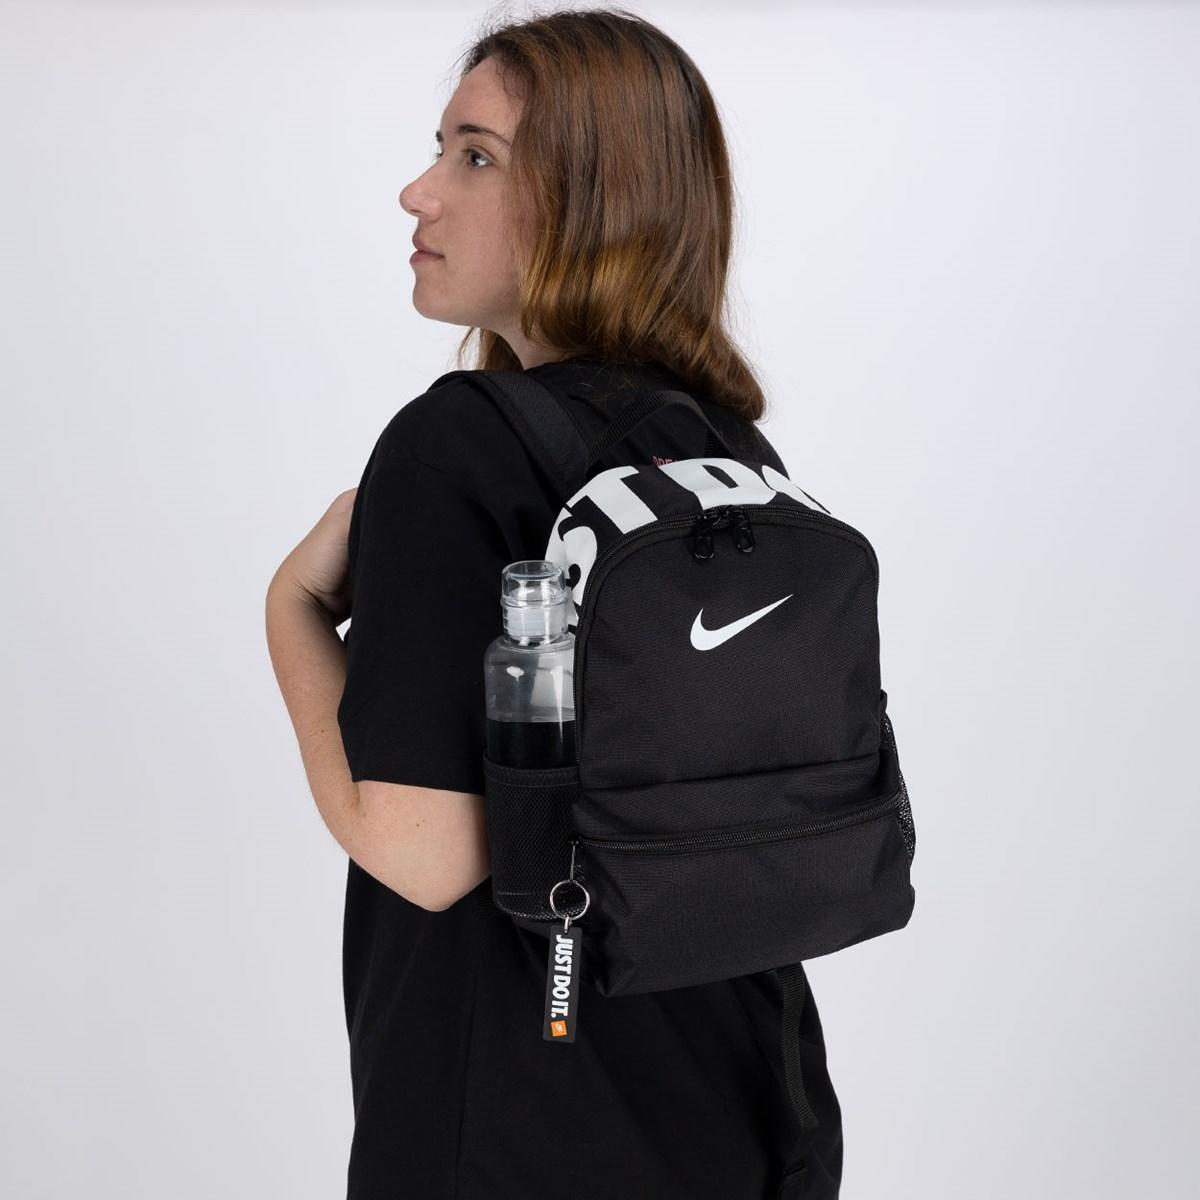 Mini Mochila Nike Brasilia Just Do It Black BA5559-013